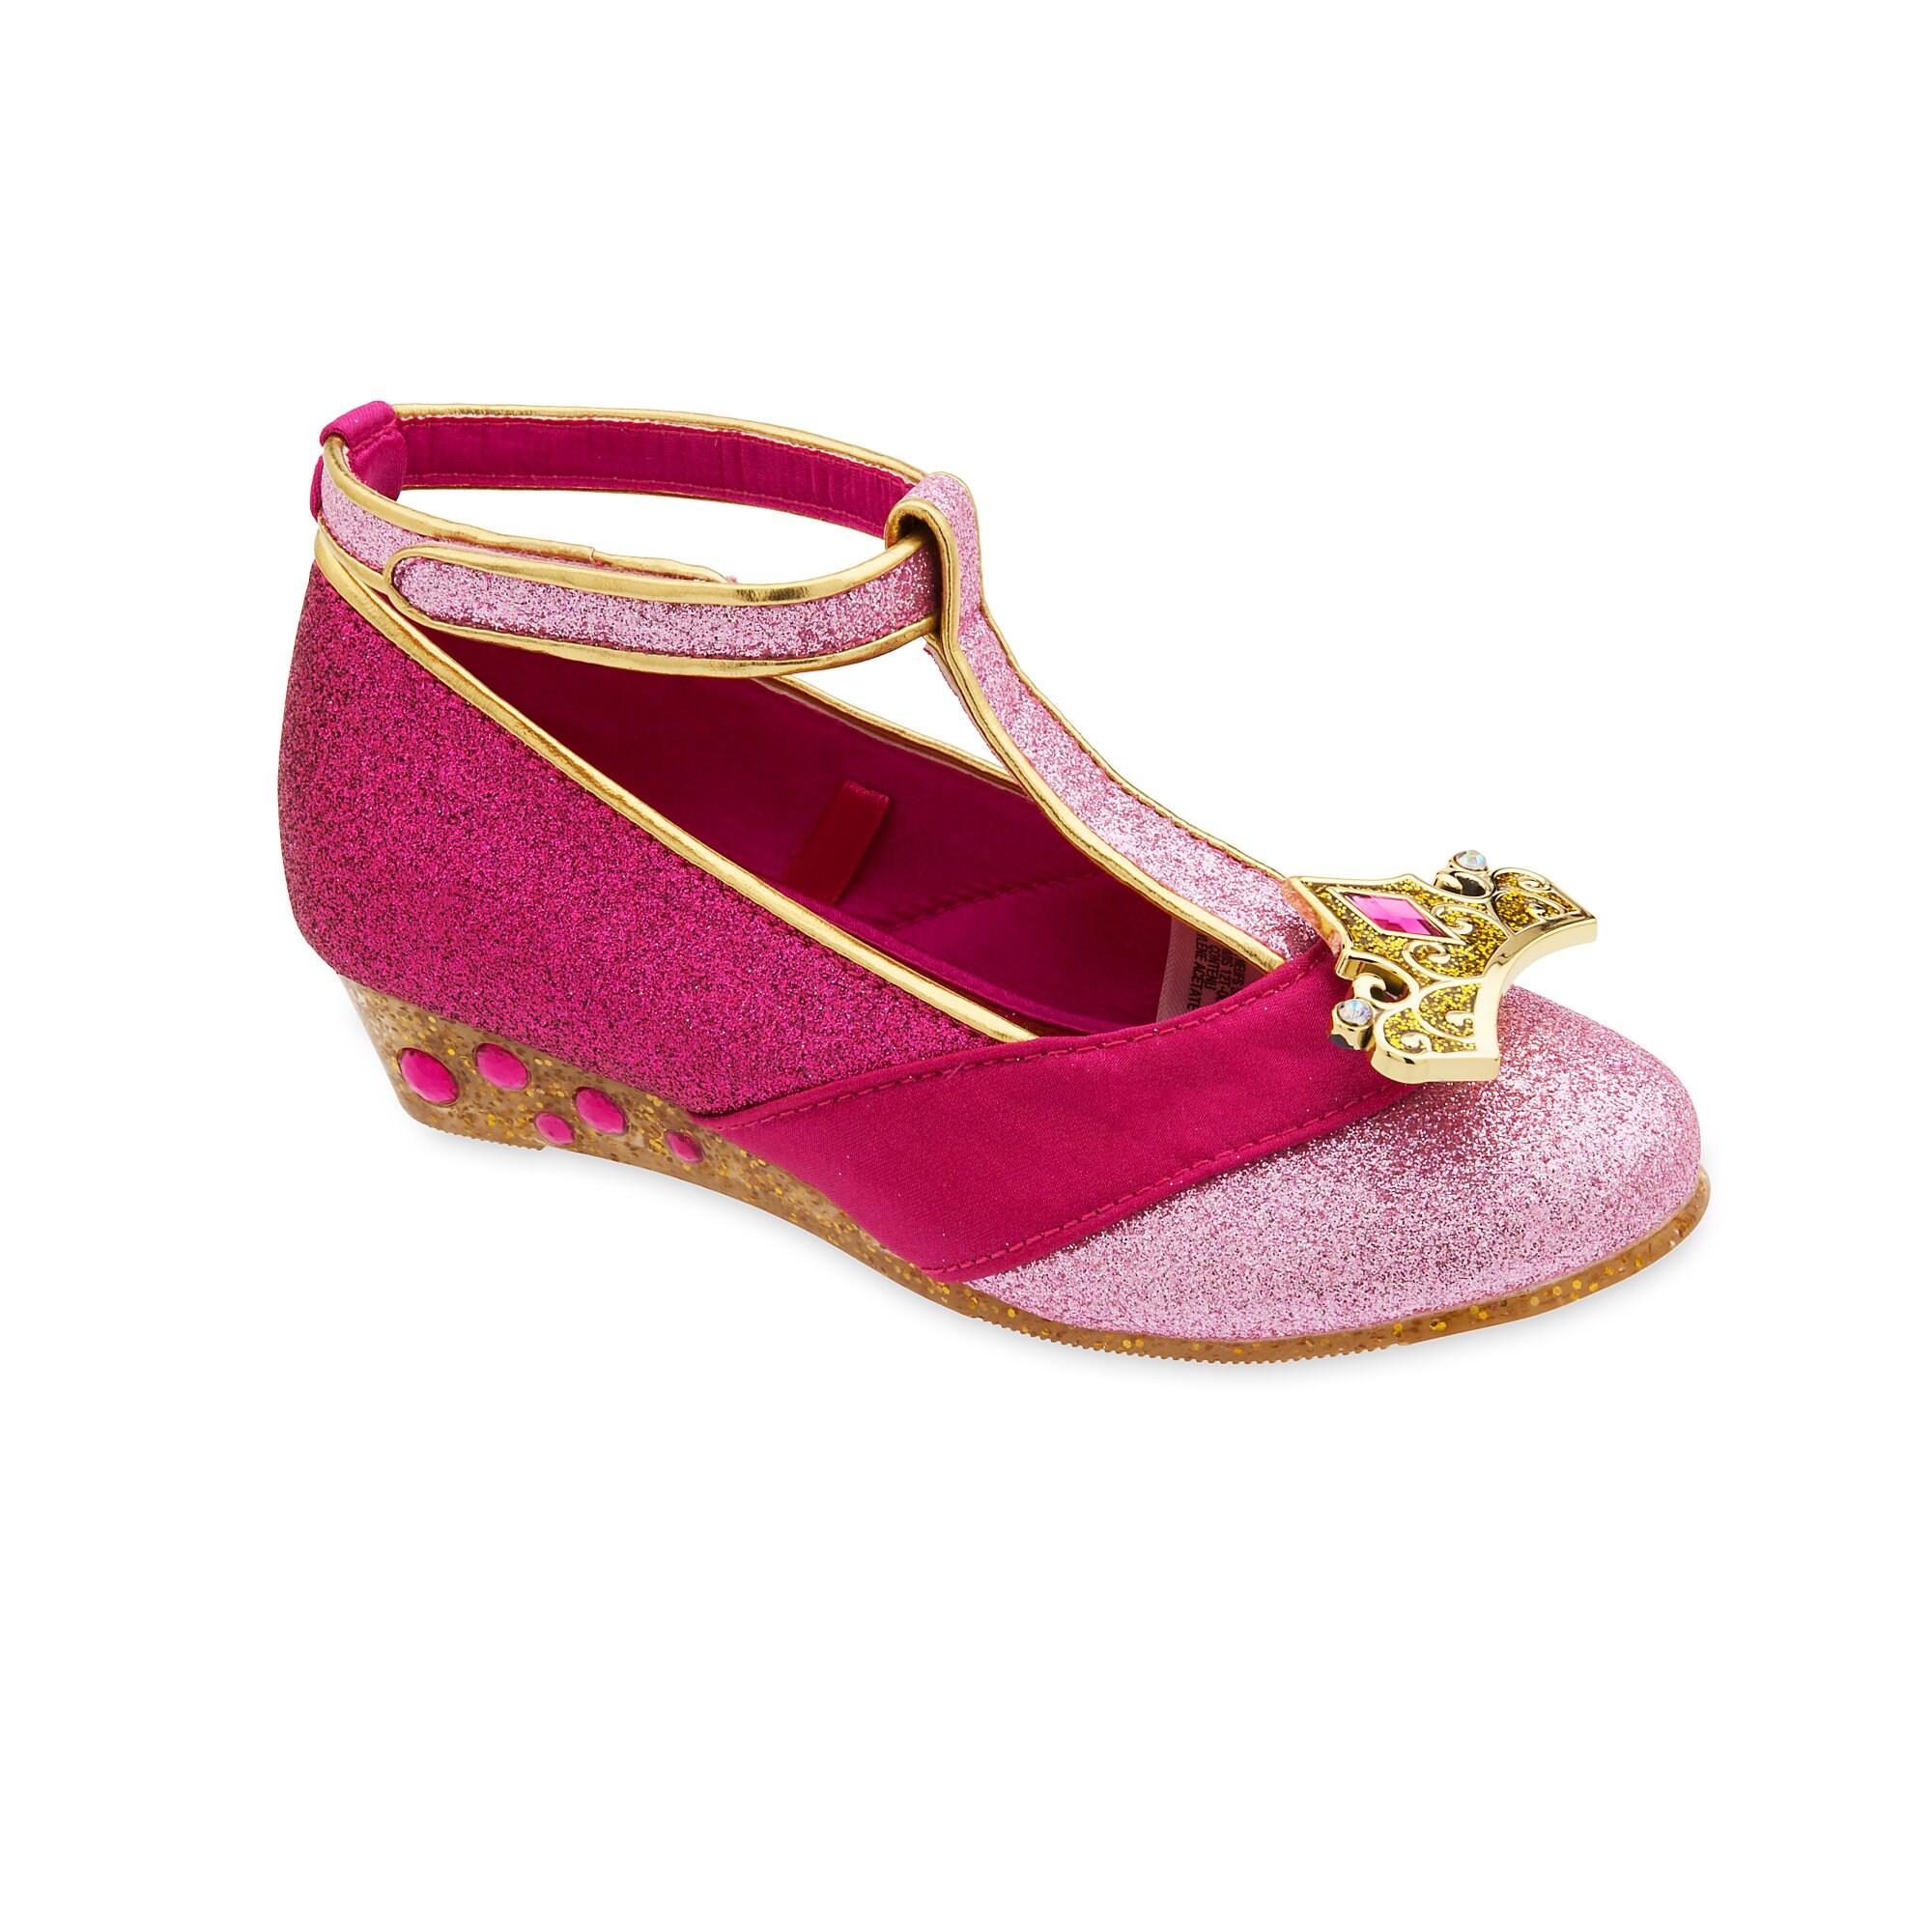 Aurora Costume Shoes for Kids - Sleeping Beauty